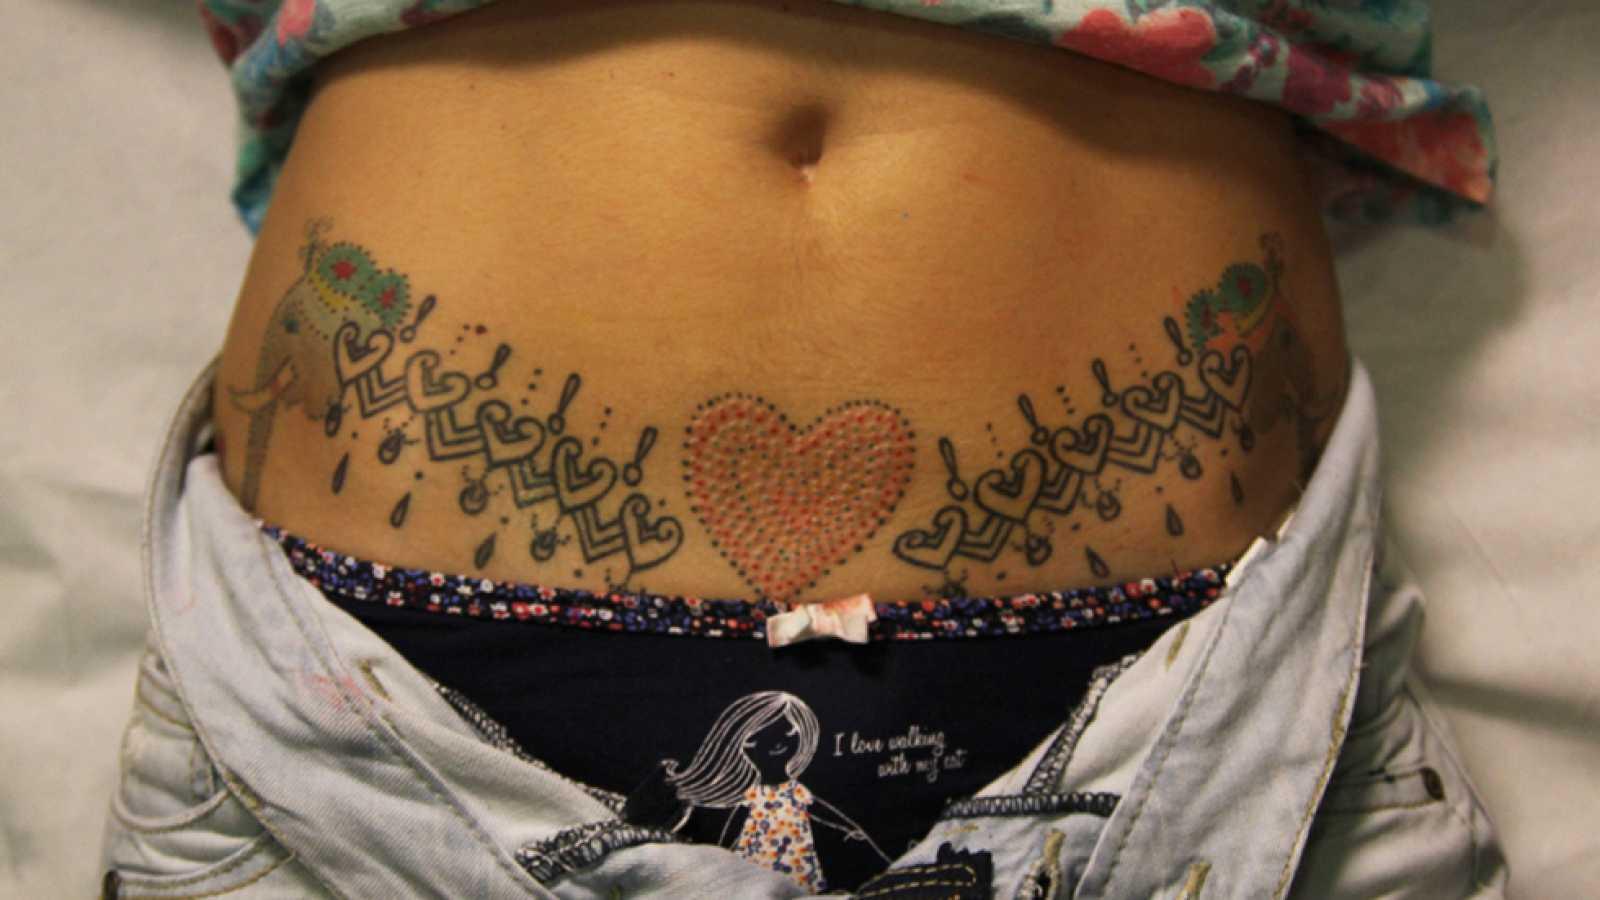 Tatuadores y tatuados Biografias en carne viva